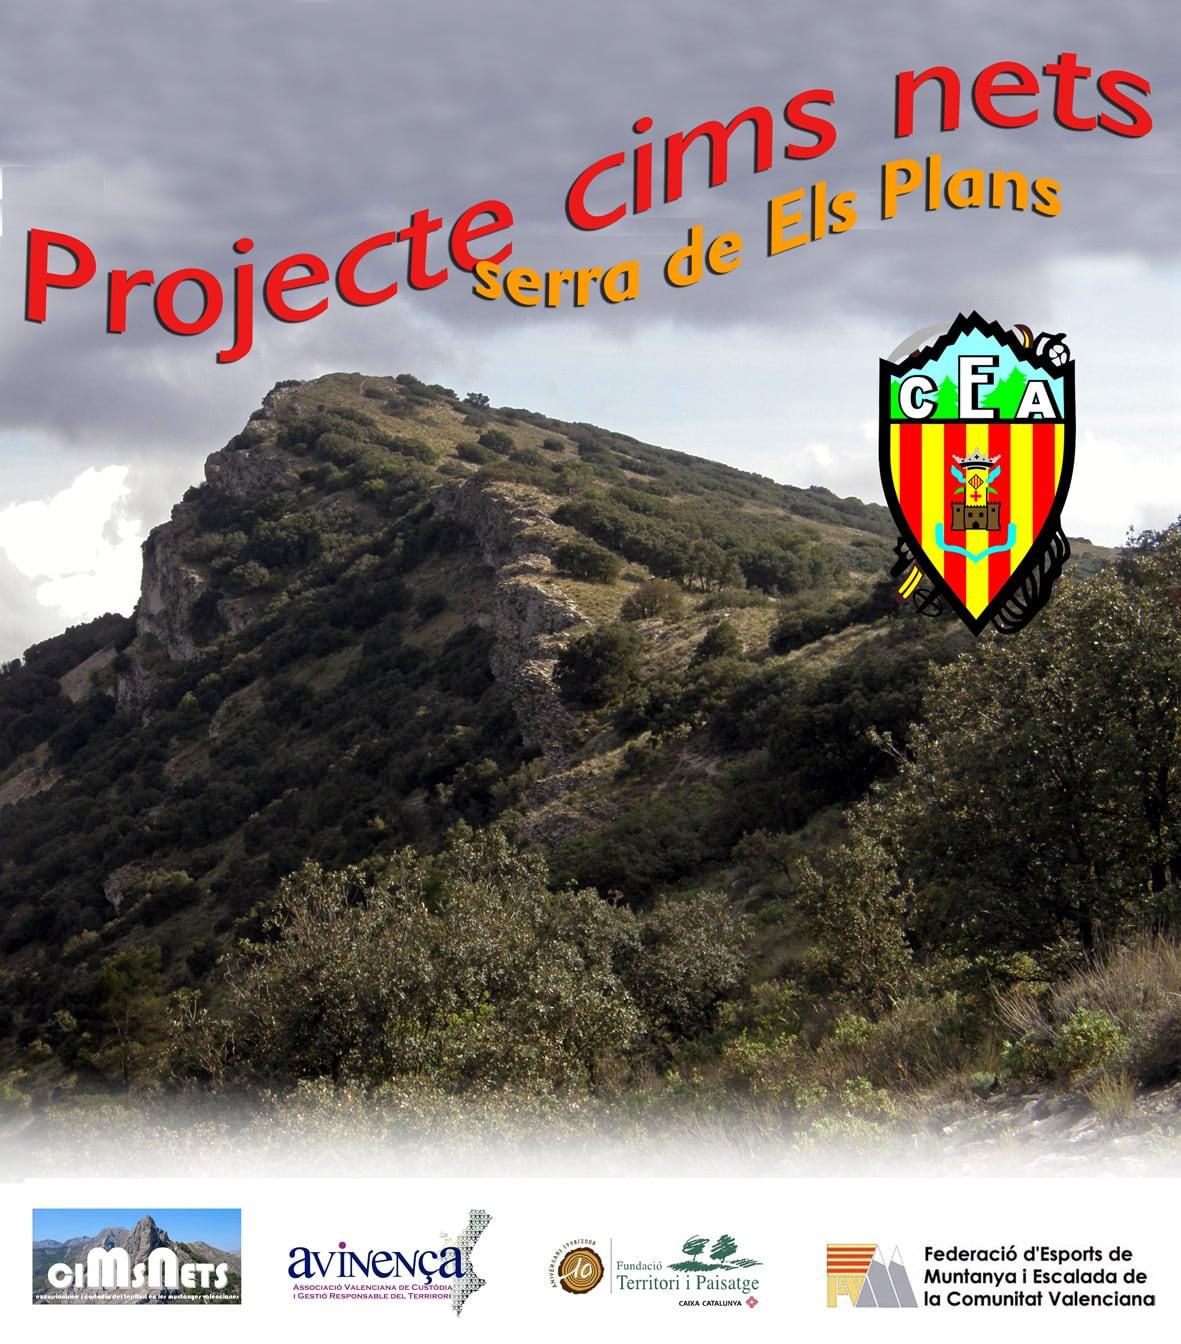 Projecte Cims Nets del Centre Excursionista d'Alcoi (CEA)